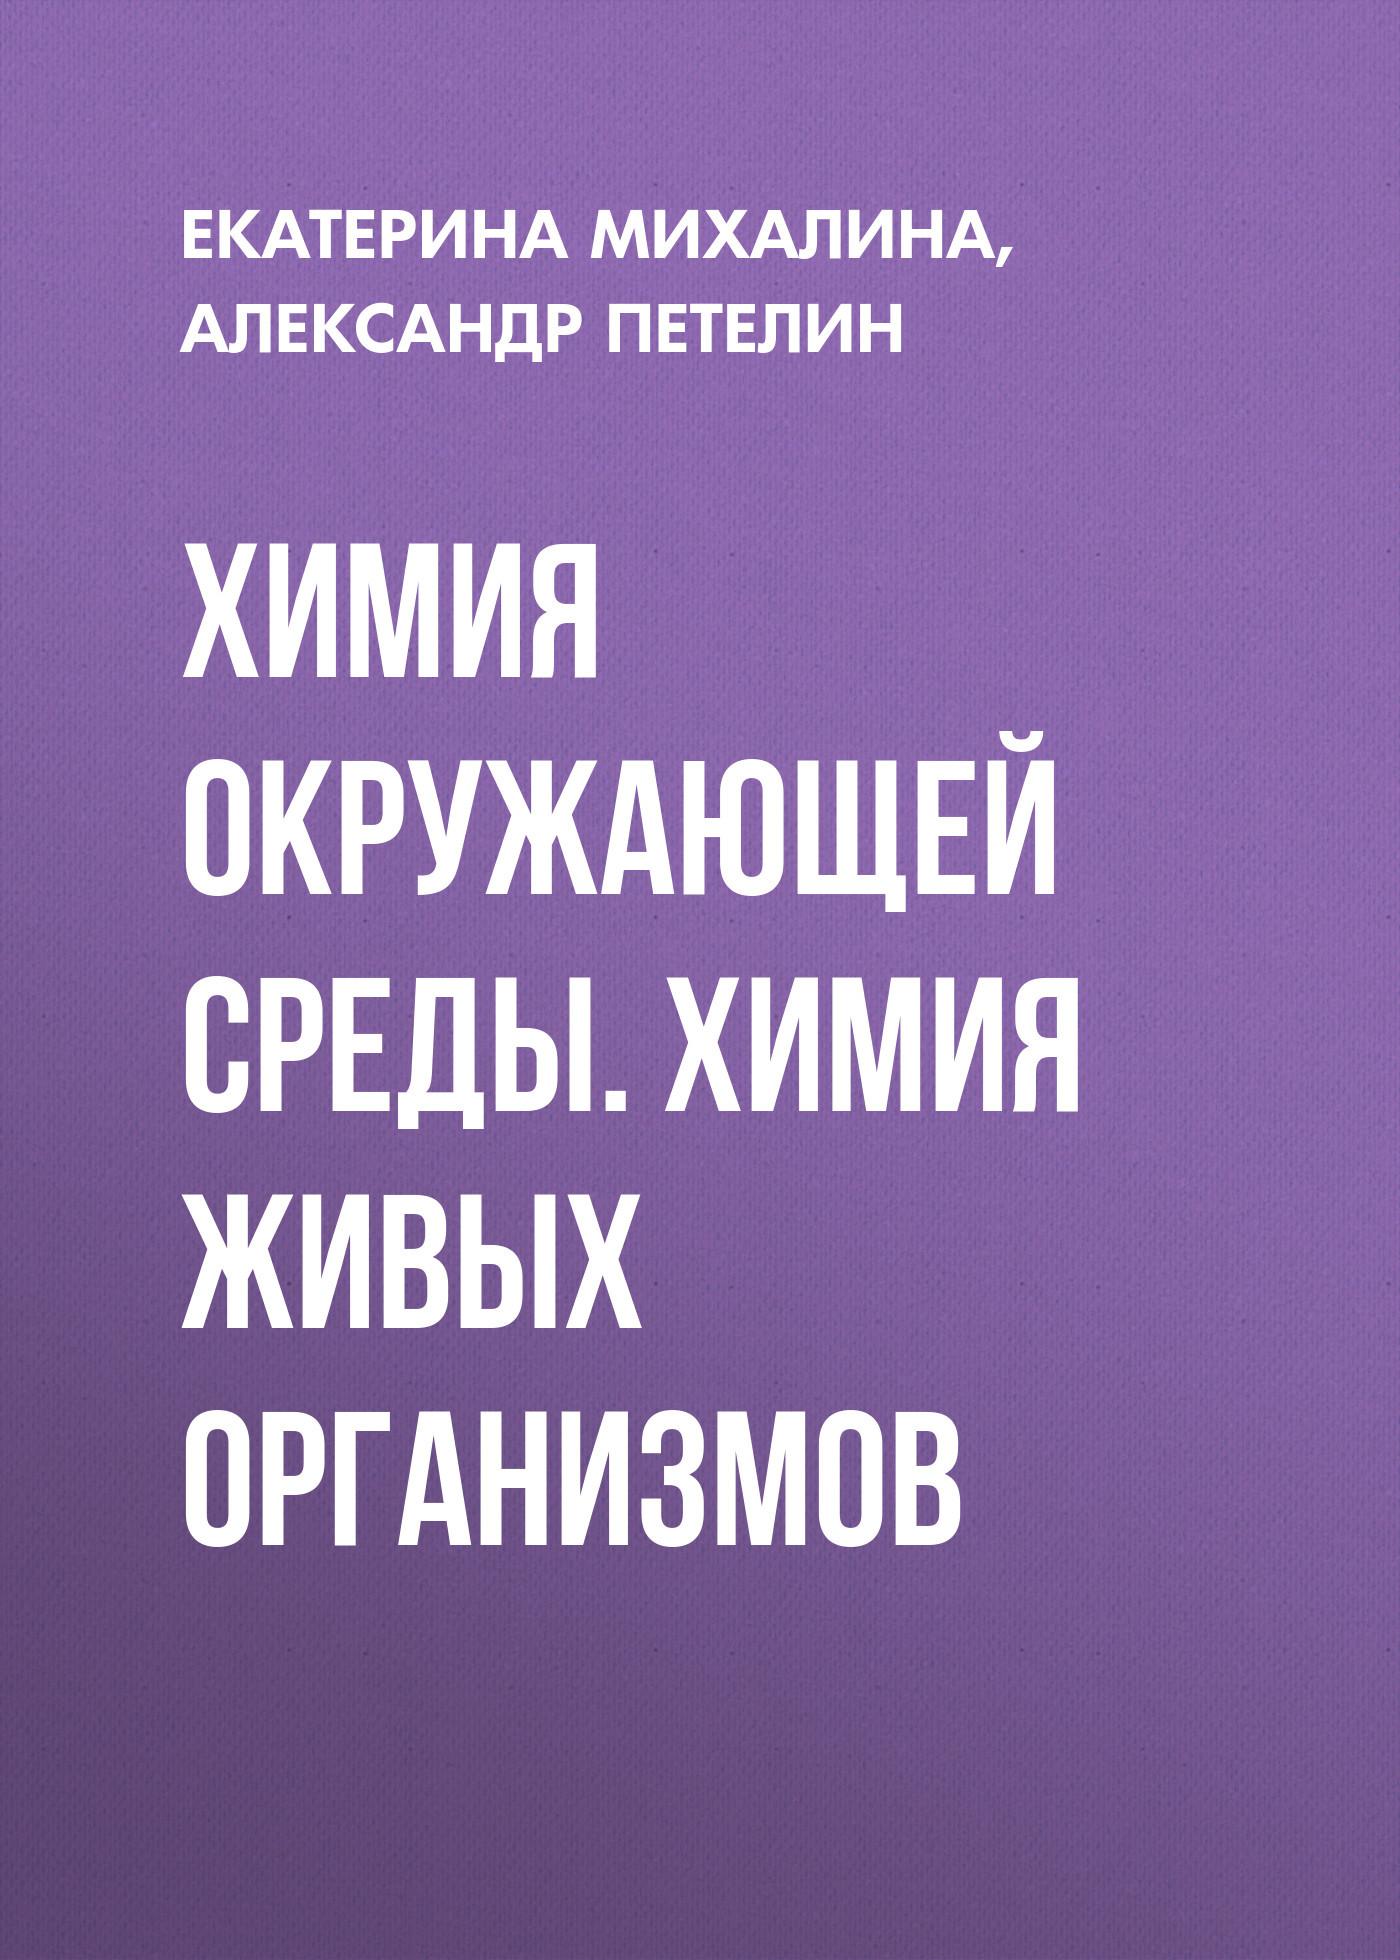 Александр Петелин бесплатно